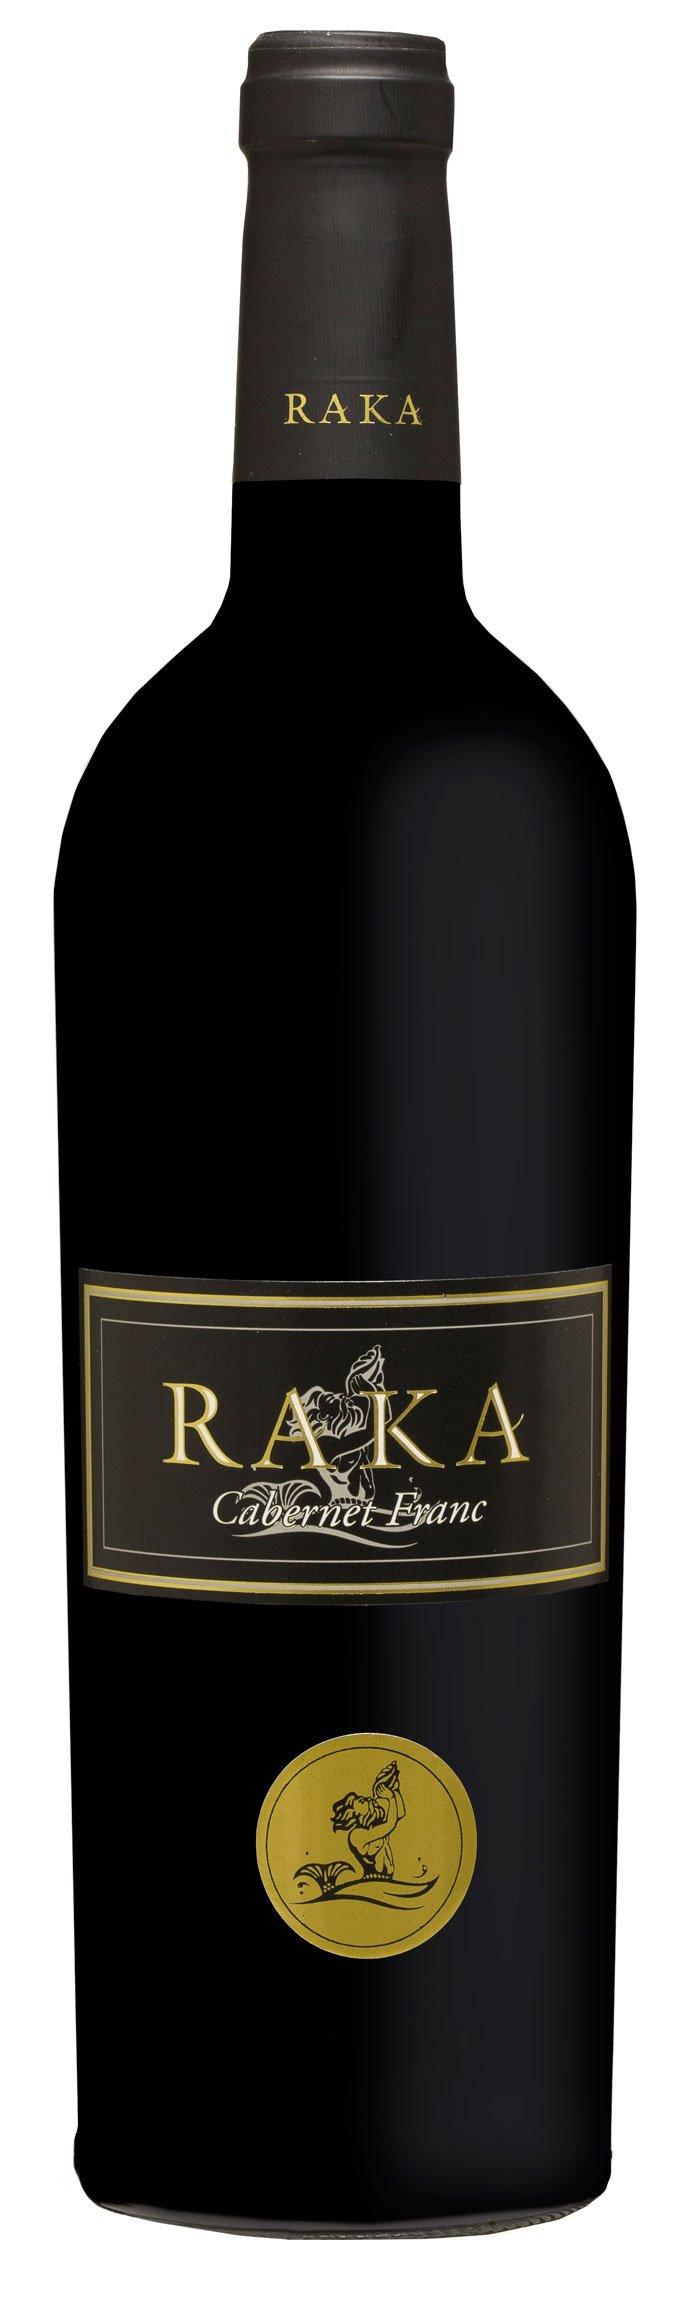 Raka-Wines-Cabernet-Franc-2015-trocken-3-x-075-l